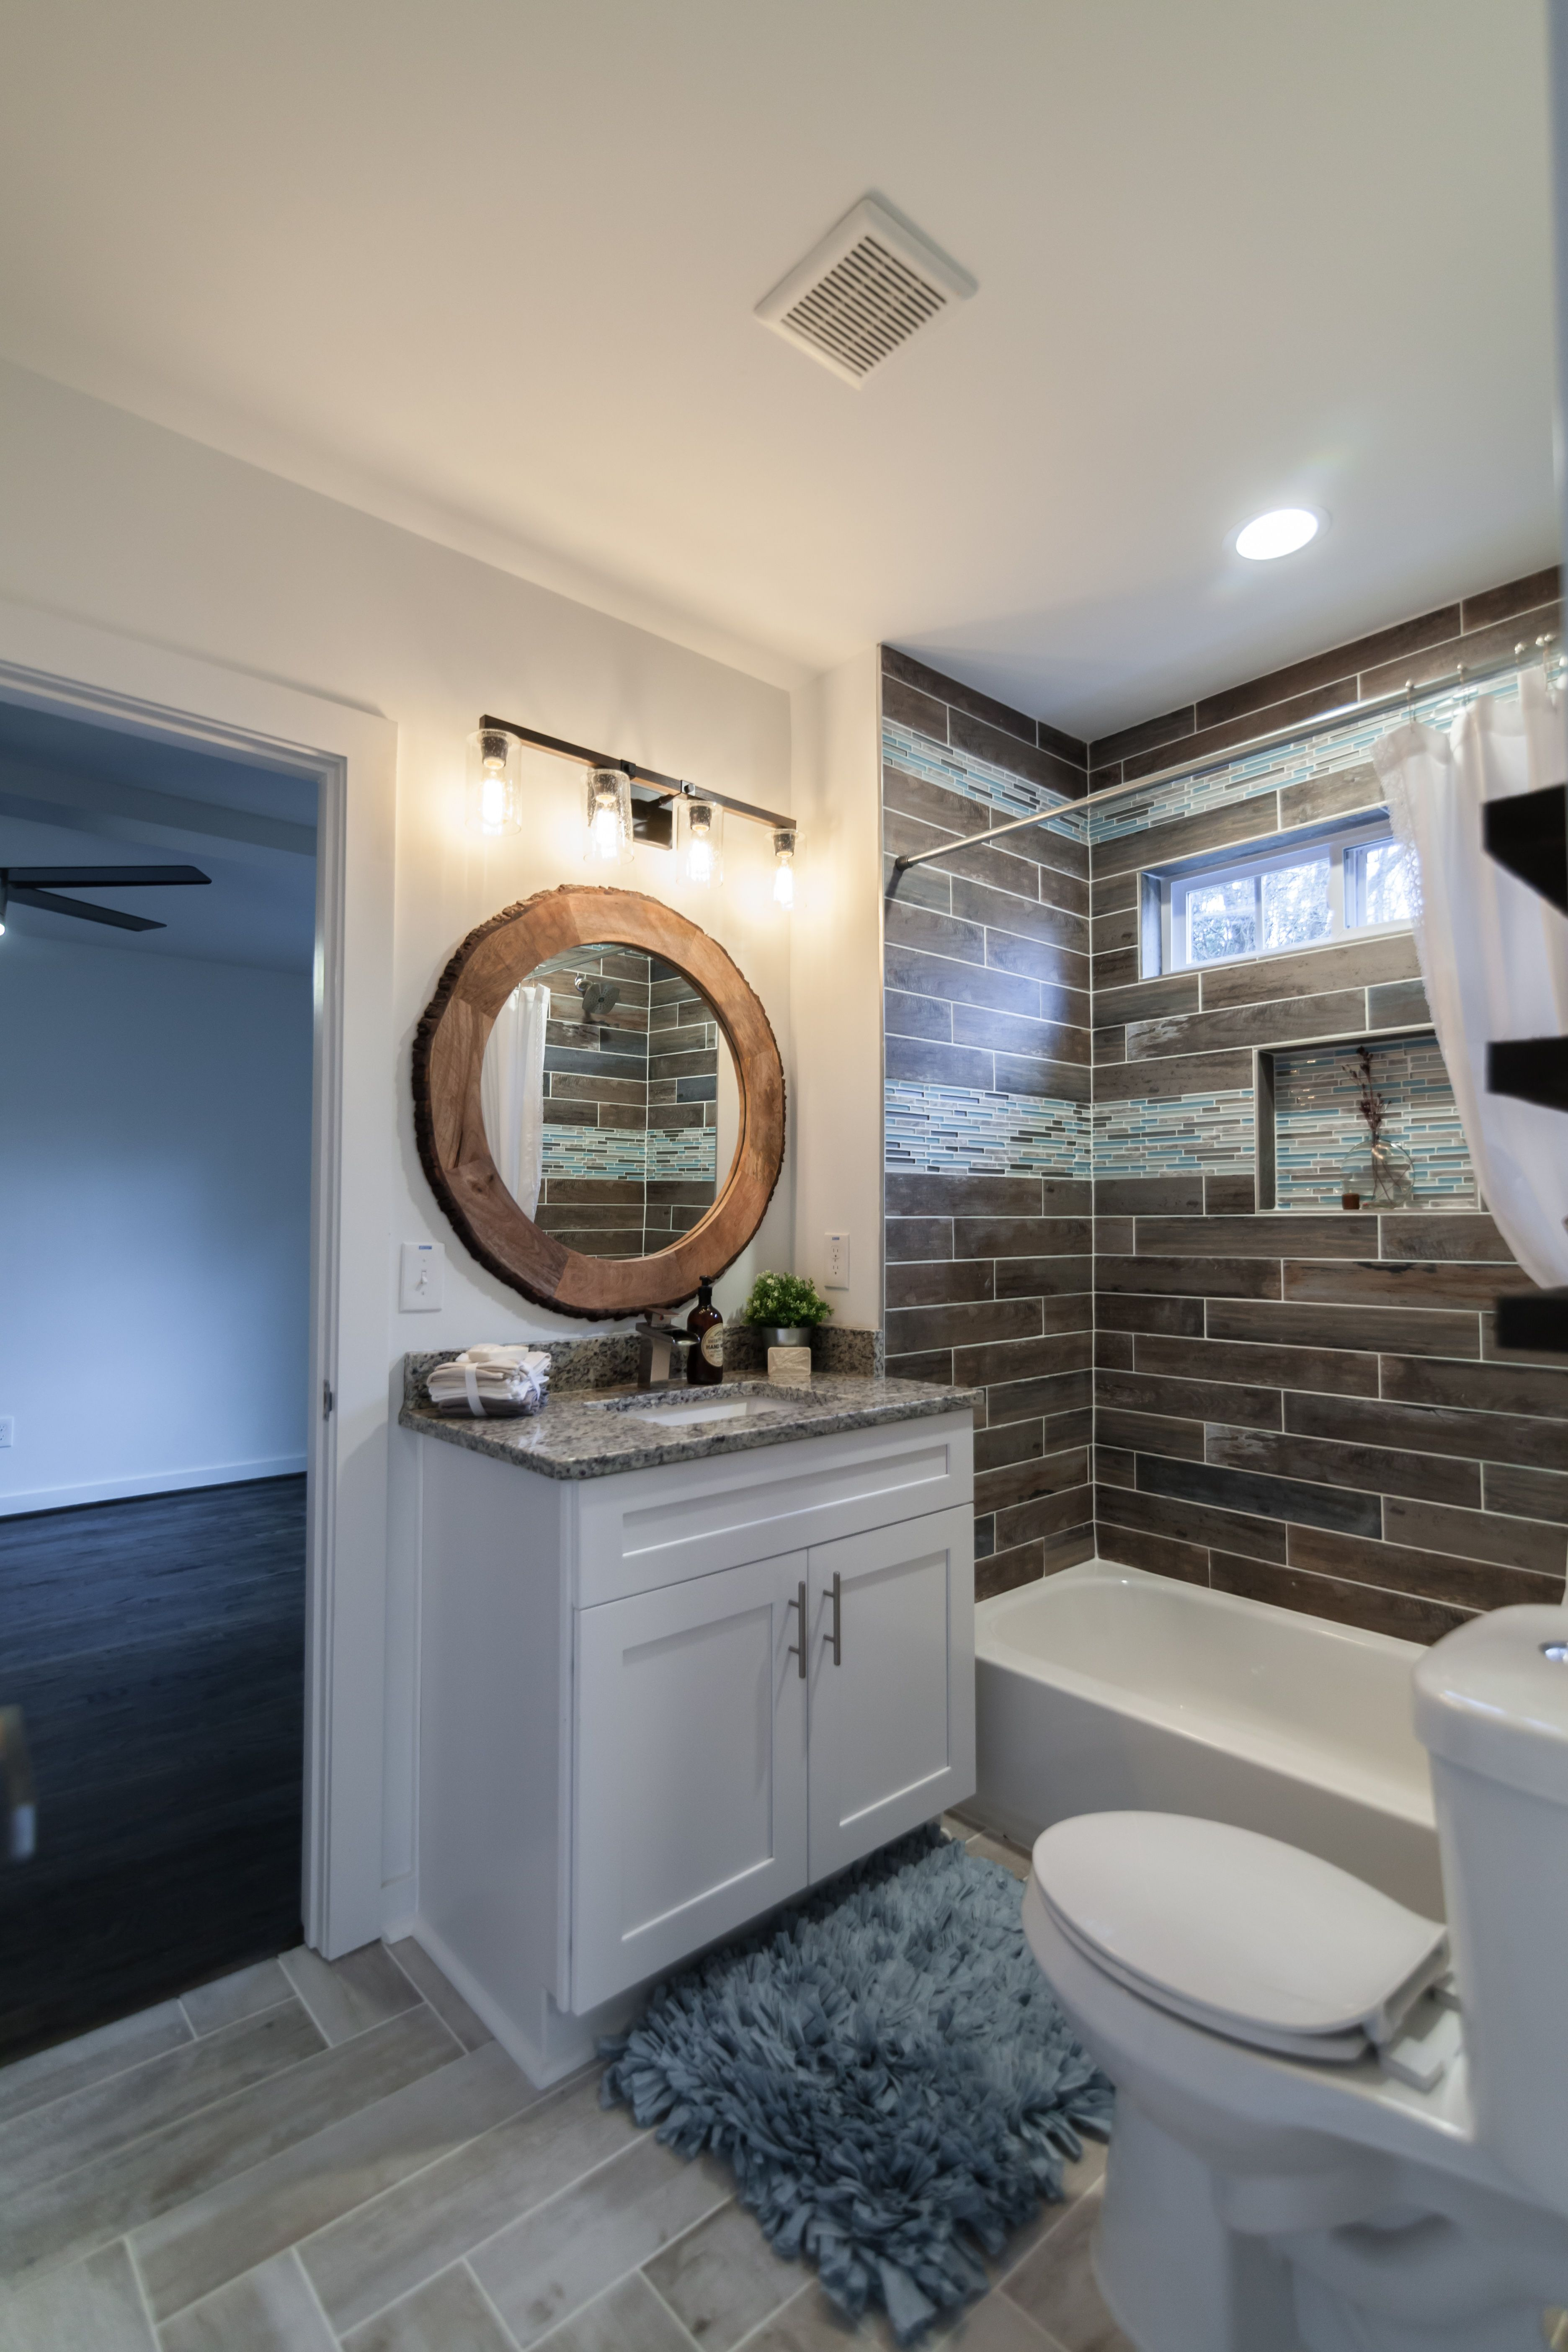 average cost of a bathroom remodel in atlanta ga